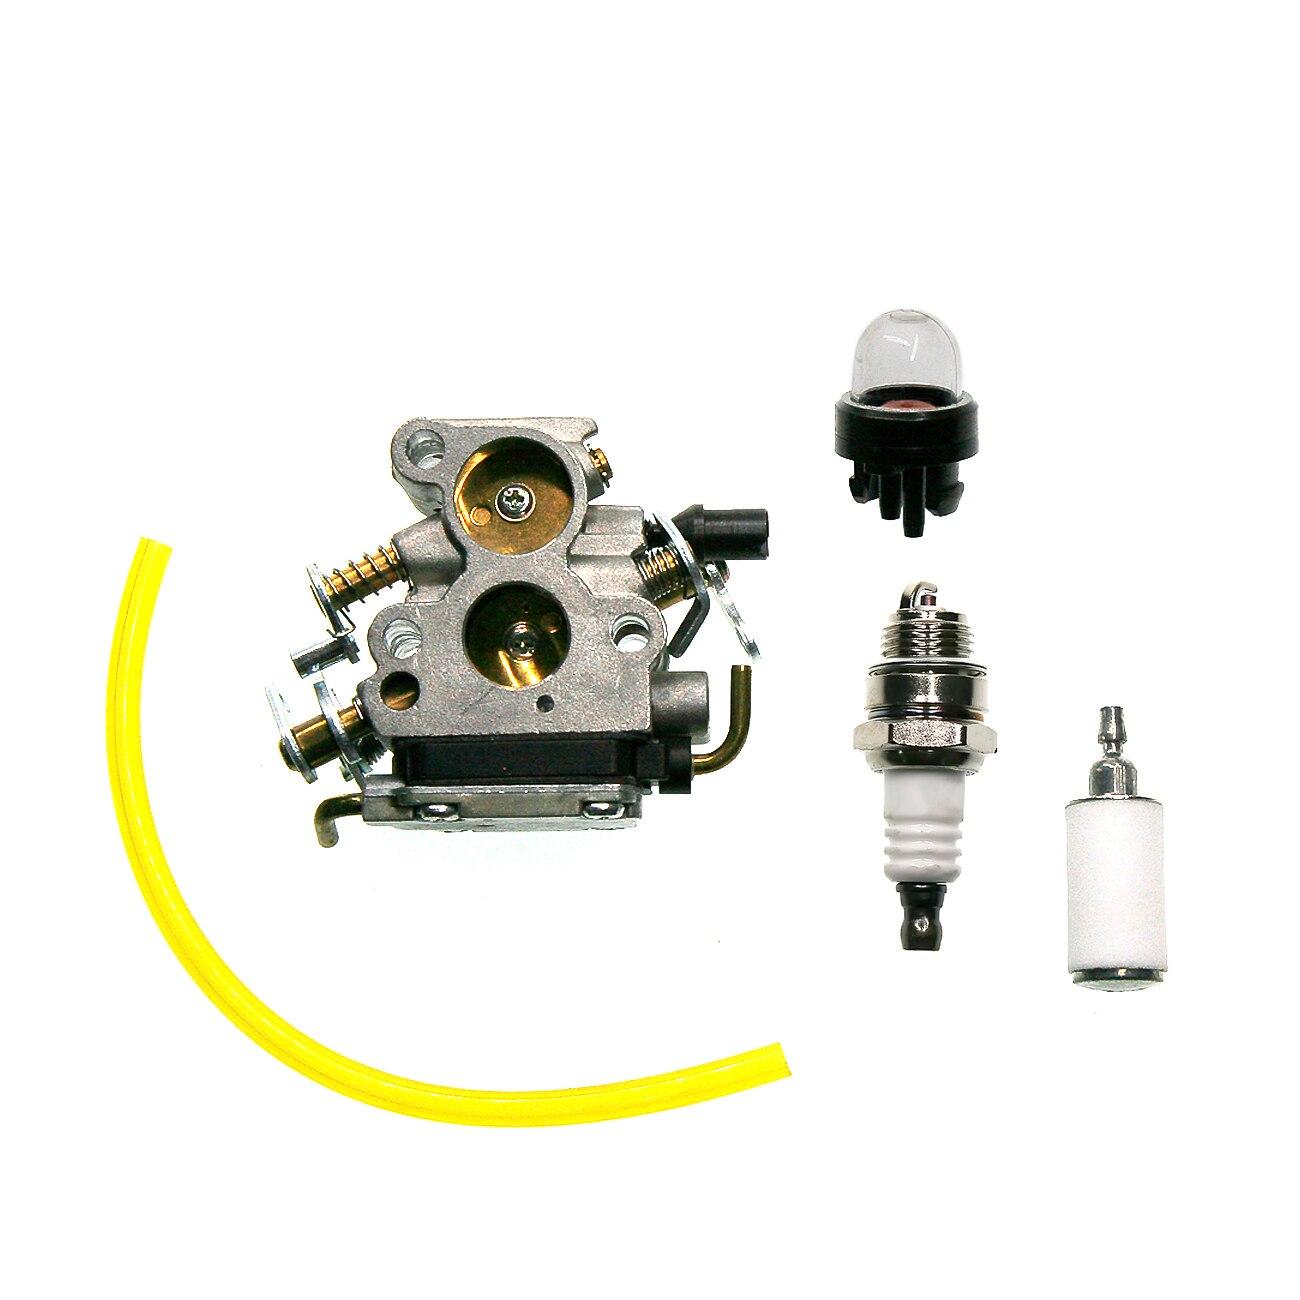 Carburetor Carb Parts For HUSQVARNA 235 236 236E 240 240E Chainsaws high performance genuine carburetor for husqvarna 125b 125bx 125bvx carb blower 545 08 18 11